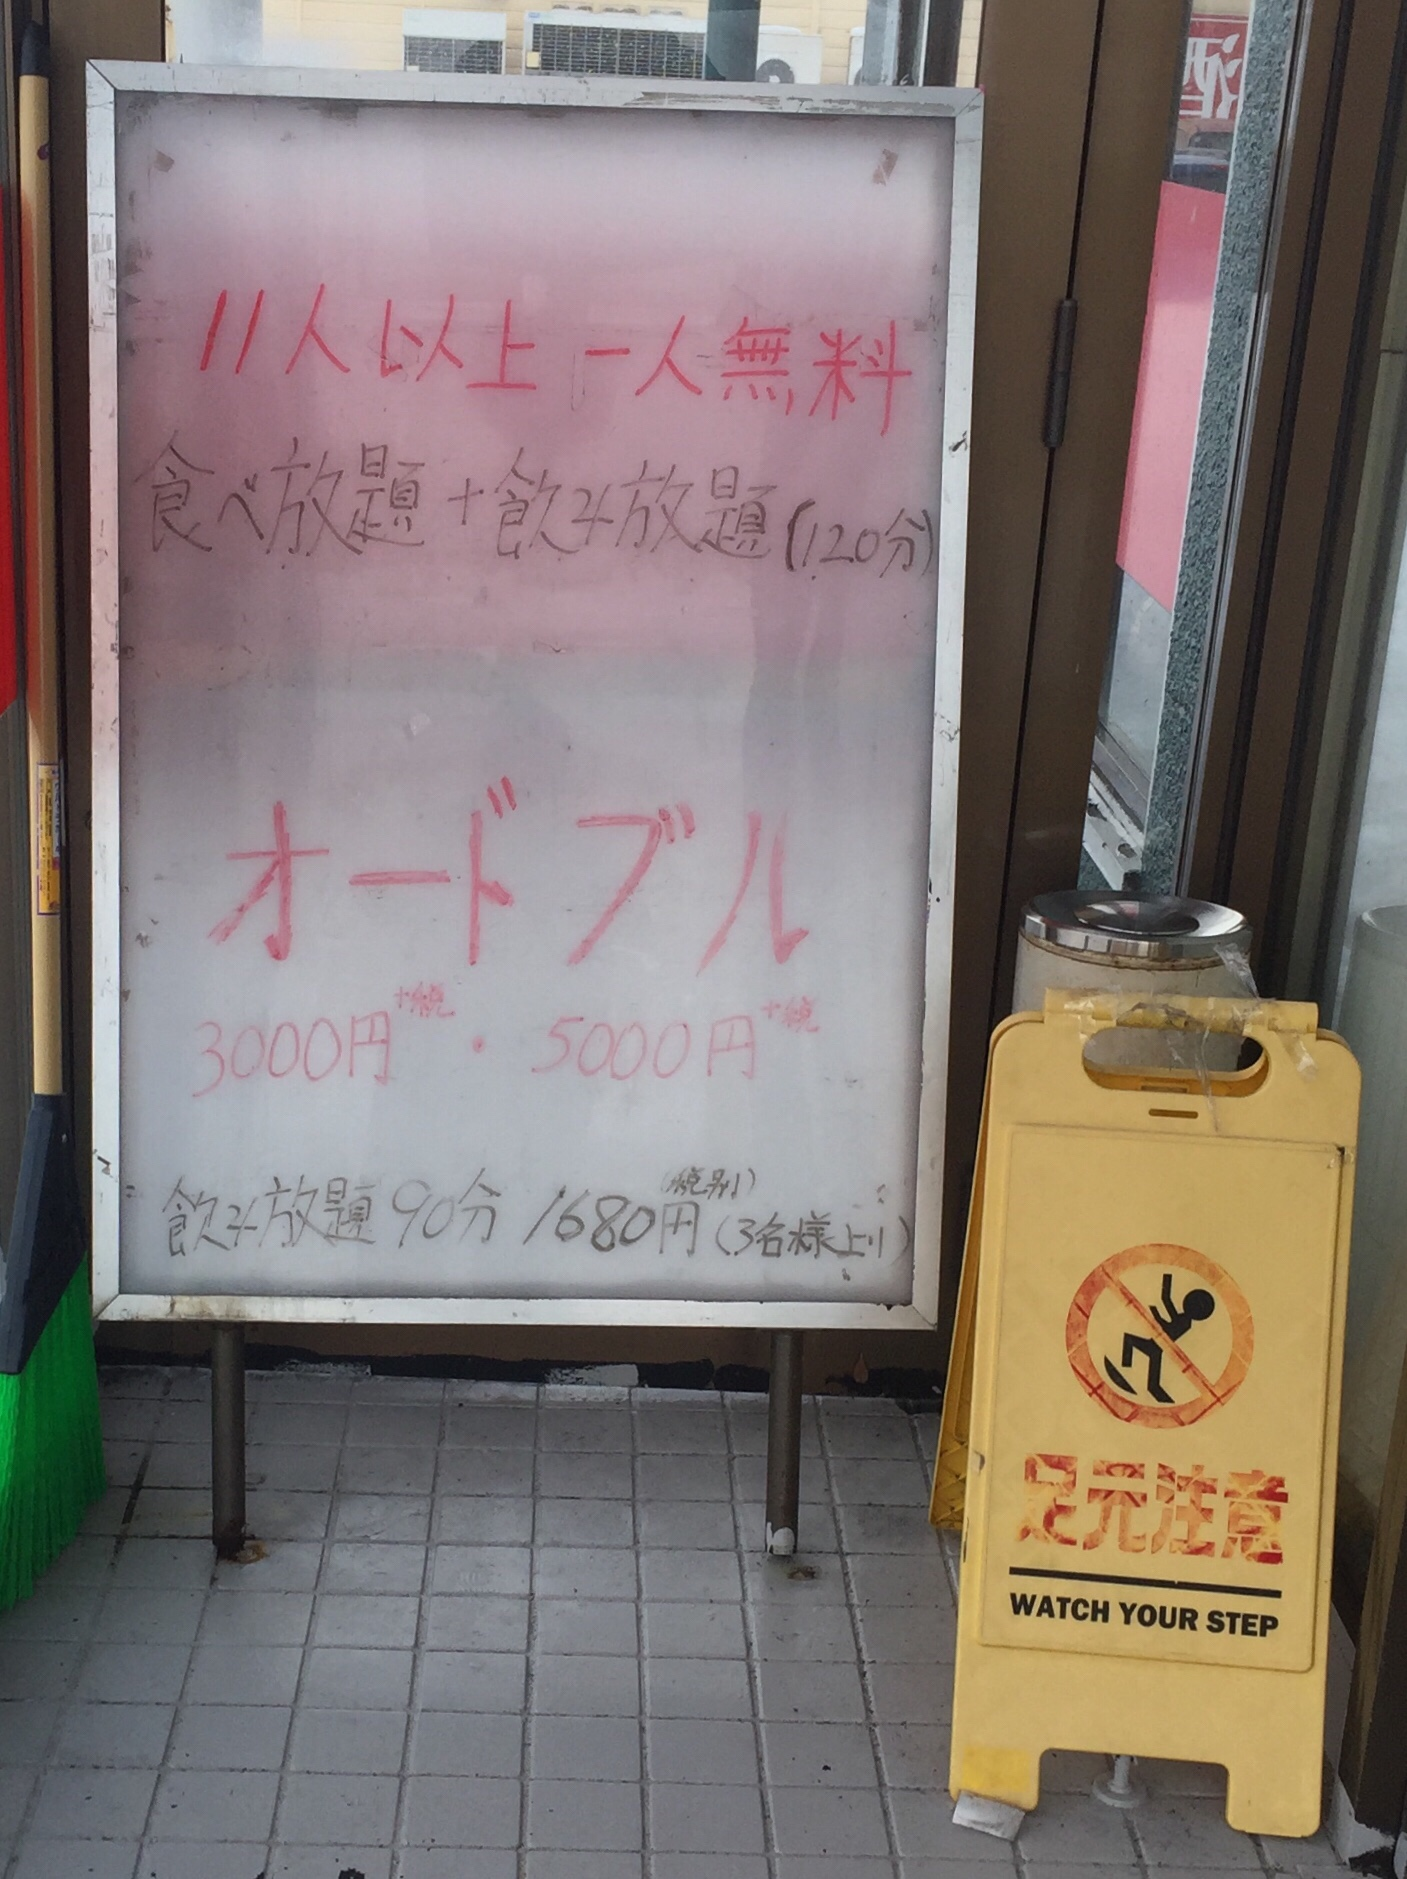 台湾料理 美味鮮 横手店 食べ放題 飲み放題